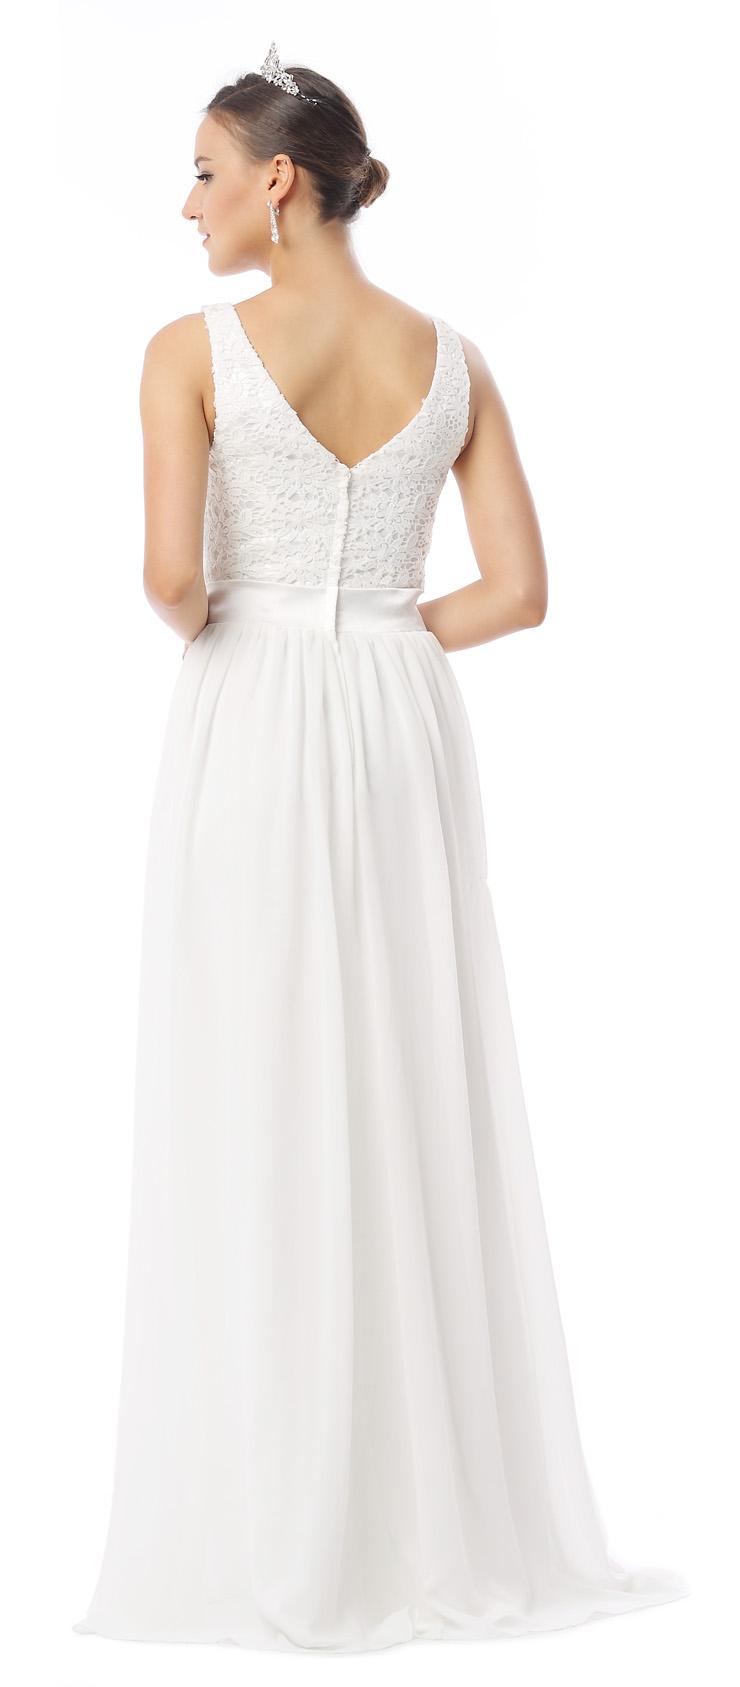 2017 fairy sheathcolumn ivory lace v neck natural waist chiffon ivory bridesmaid dressesbridesmaid dresses for cheap fairy prom dresses 2015 new bridesmaid ombrellifo Gallery